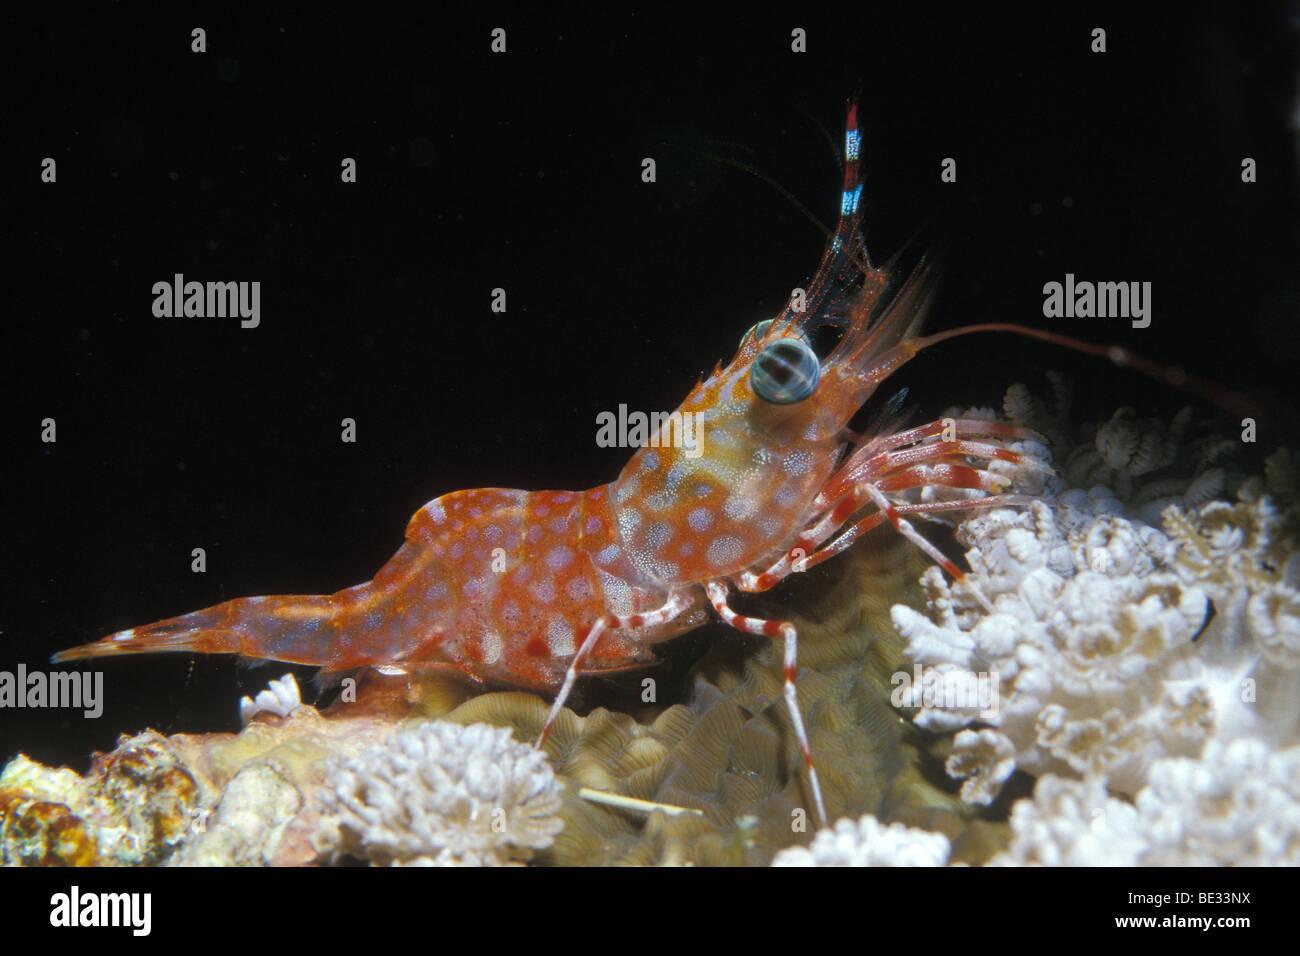 Dancing Shrimp, Cinetorhynchus reticulatus, Nuweiba, Sinai, Red Sea, Egypt - Stock Image